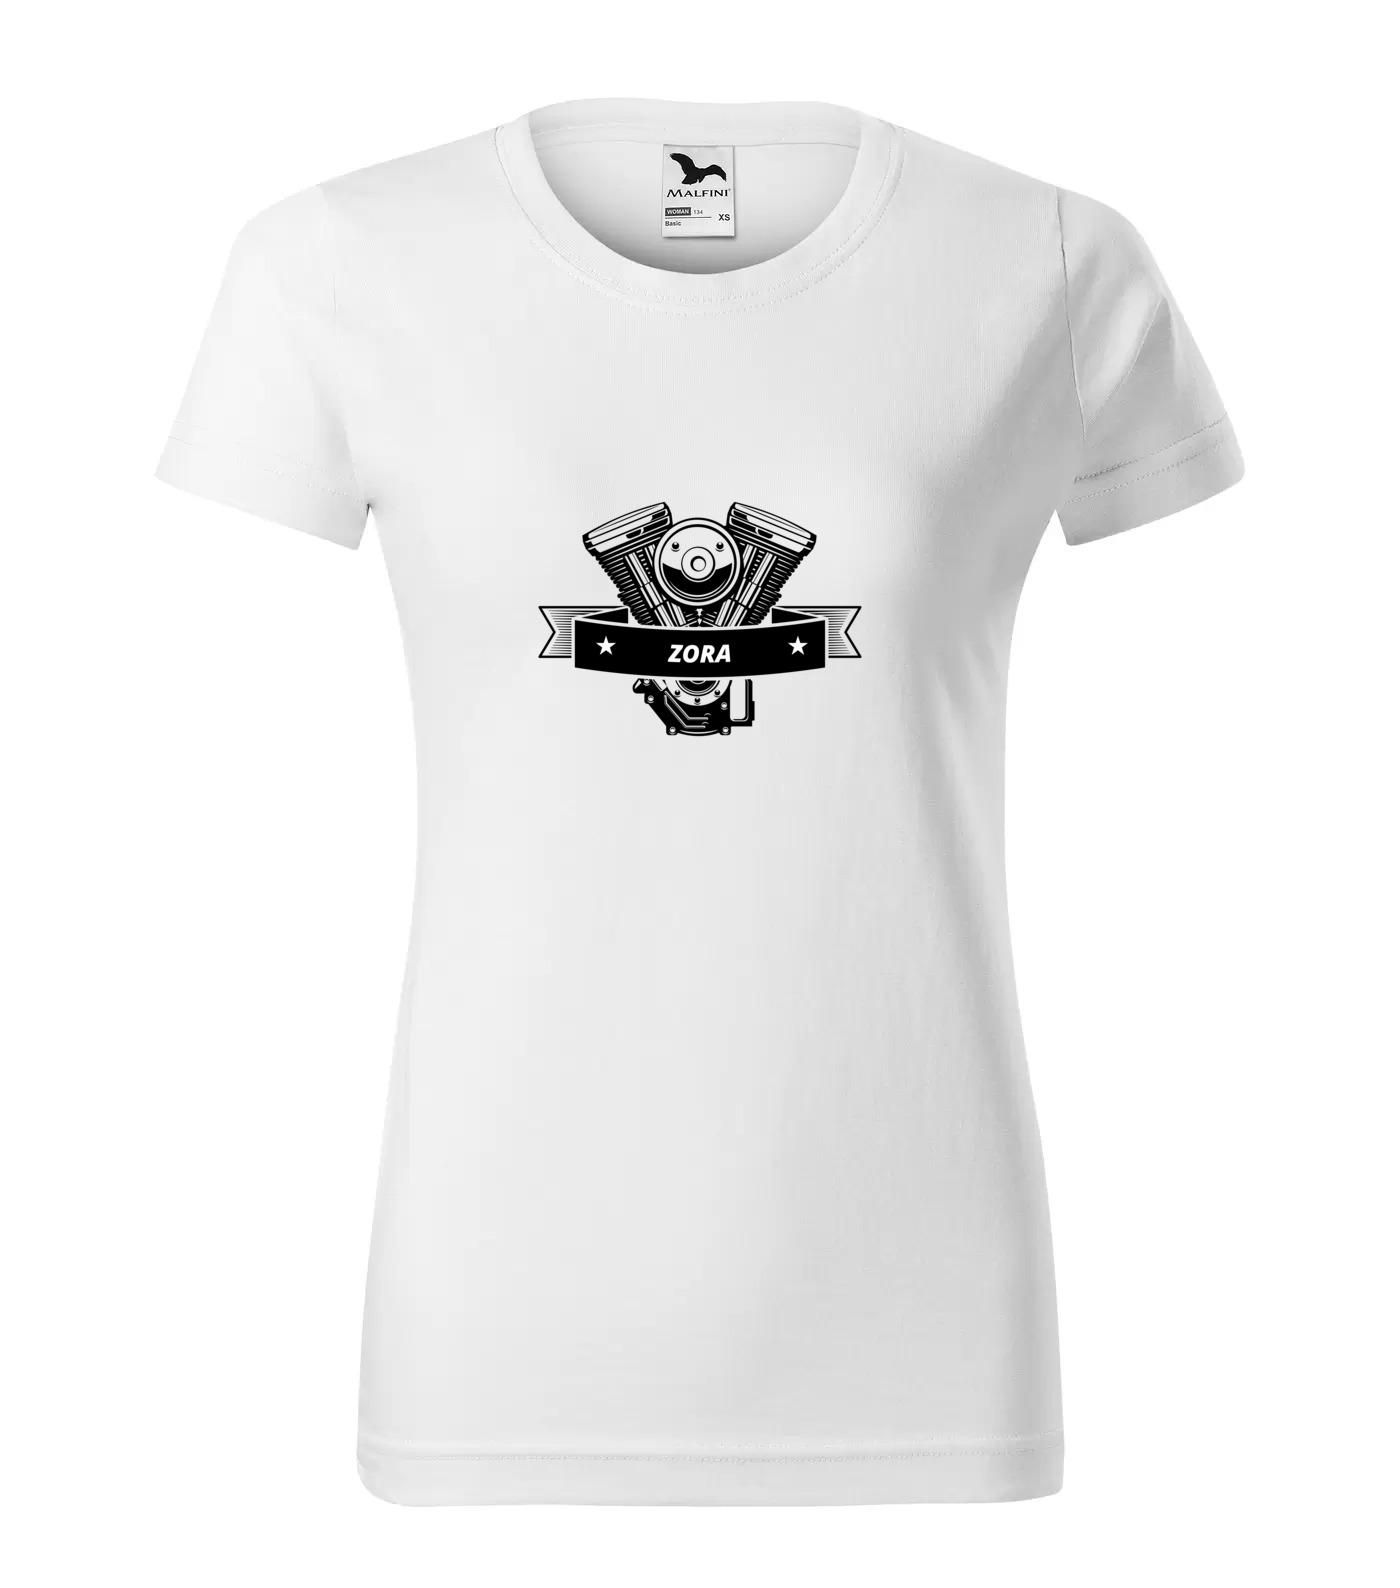 Tričko Motorkářka Zora